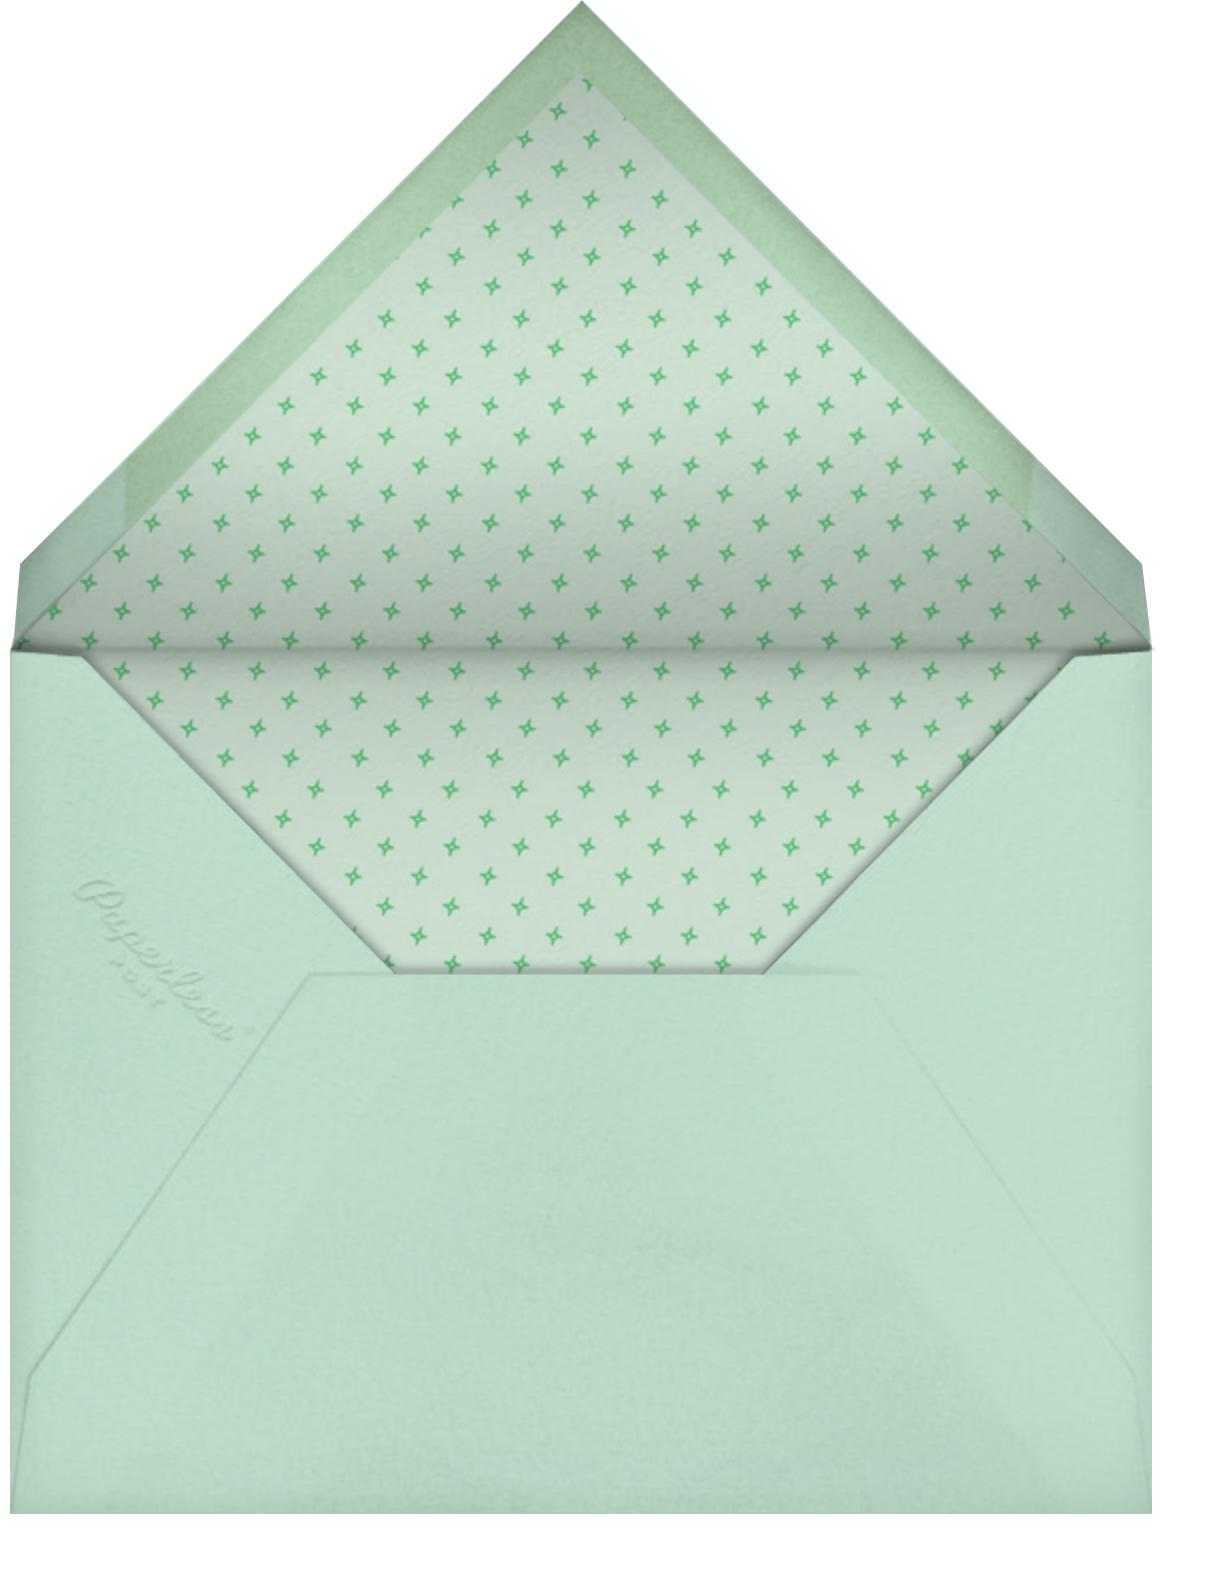 Bunny - Mint - Paperless Post - Easter - envelope back